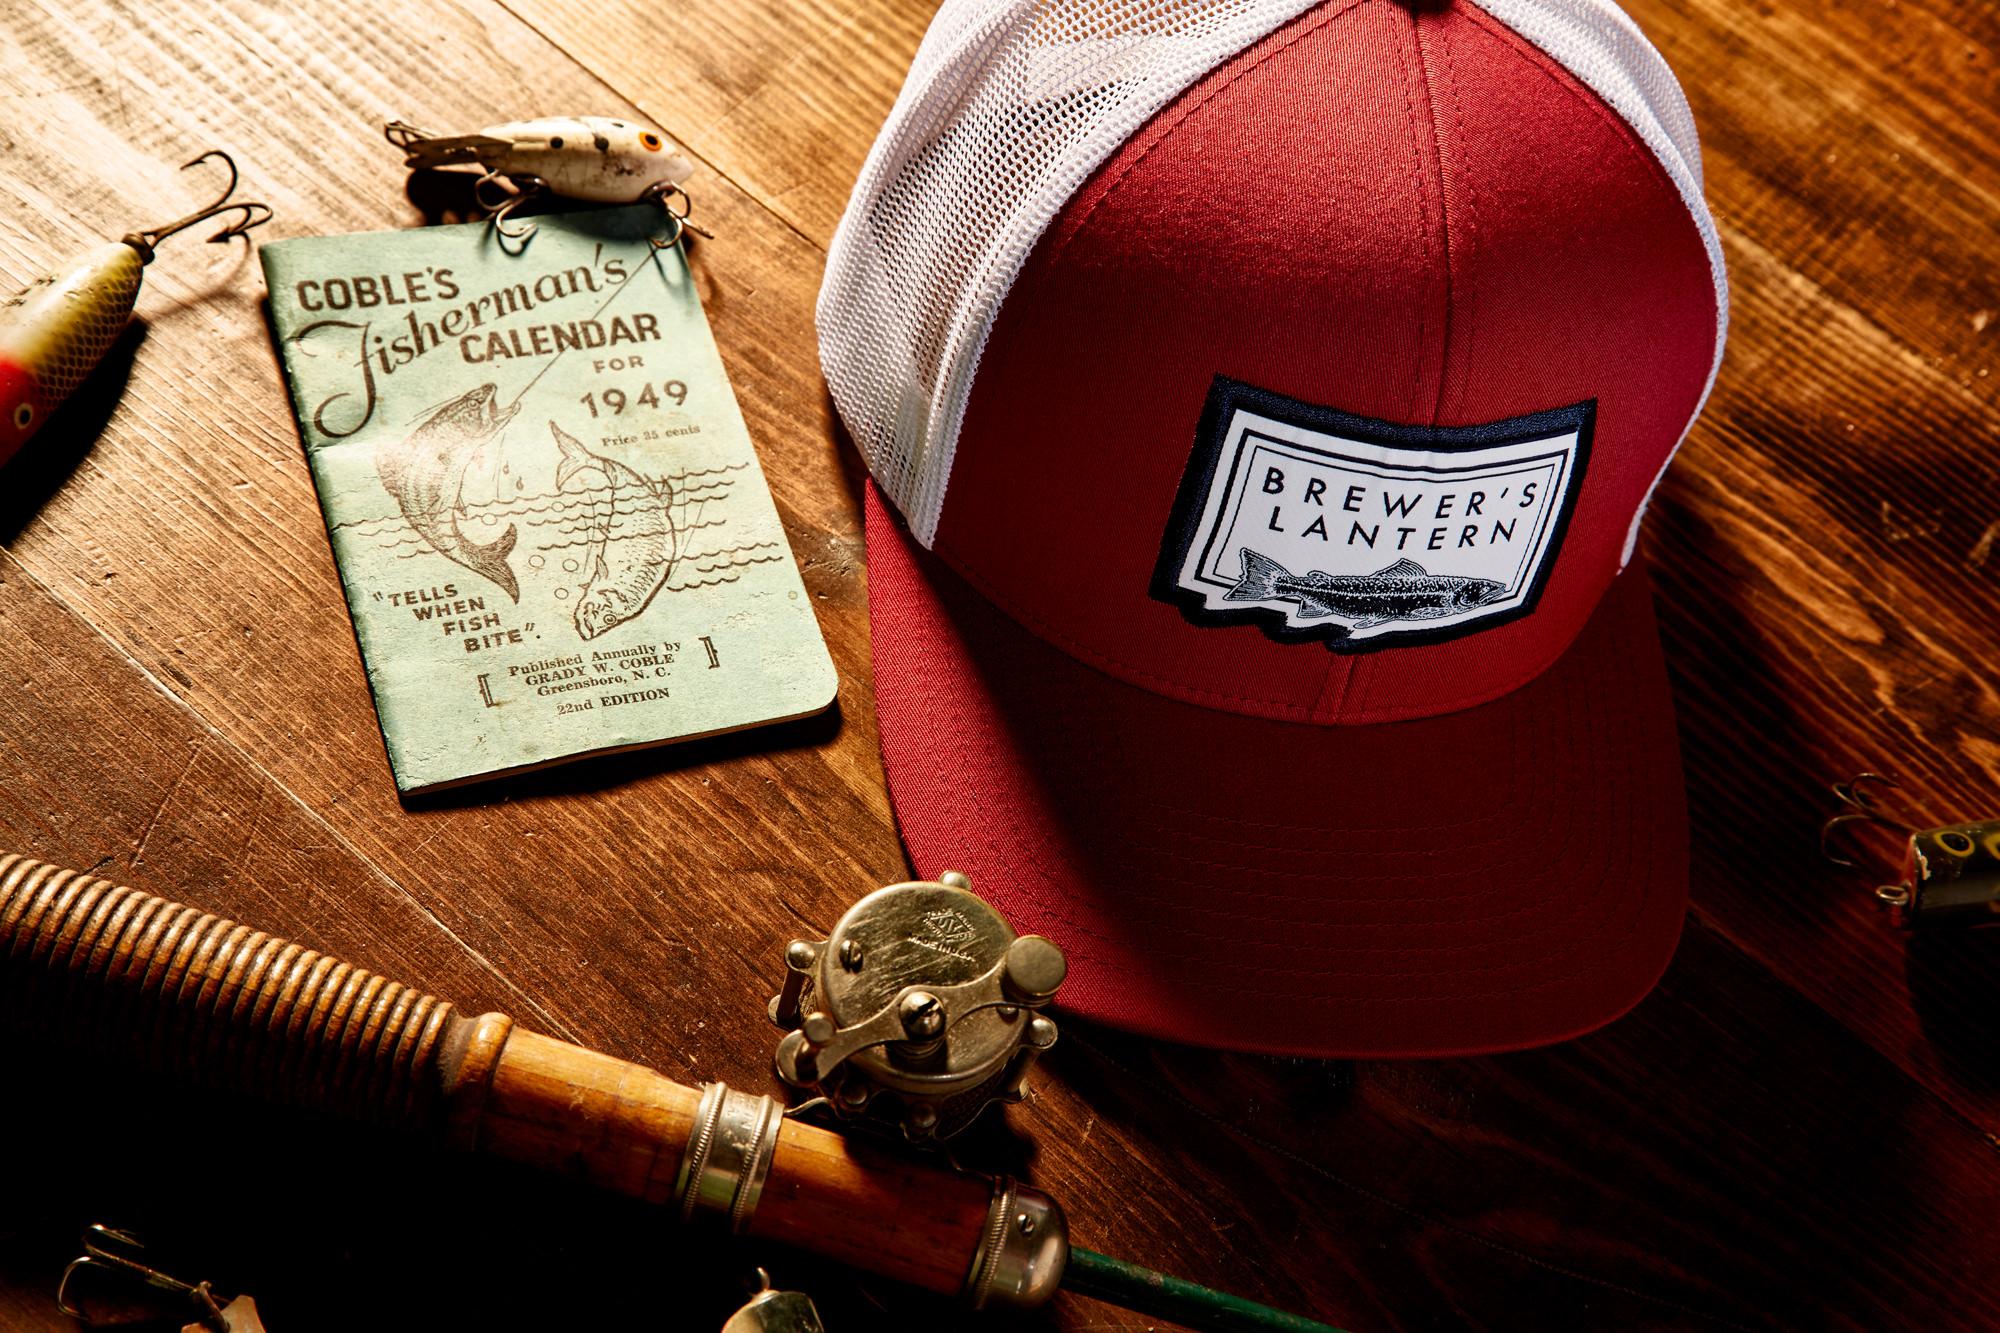 fashion-apparel-photography-winslett-brewers-lantern-02.jpg